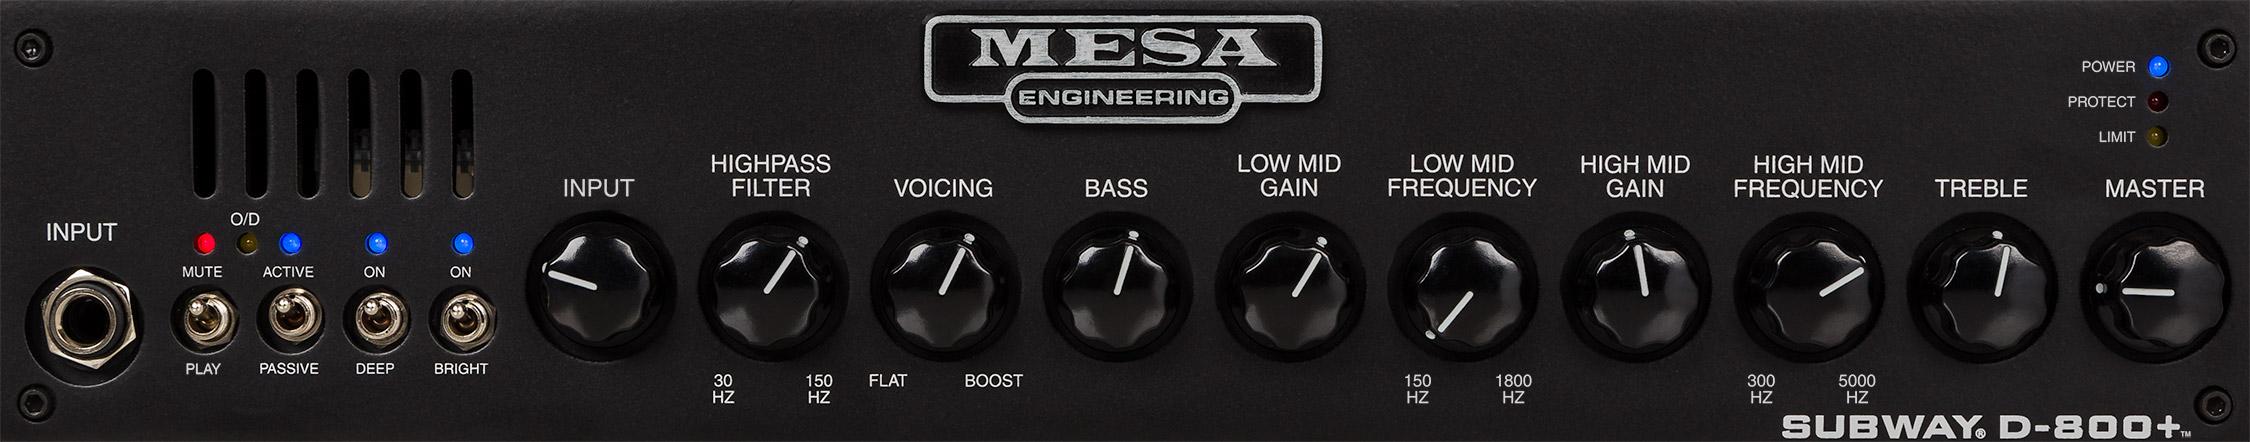 Subway D-800+ Bass Amp Front Panel